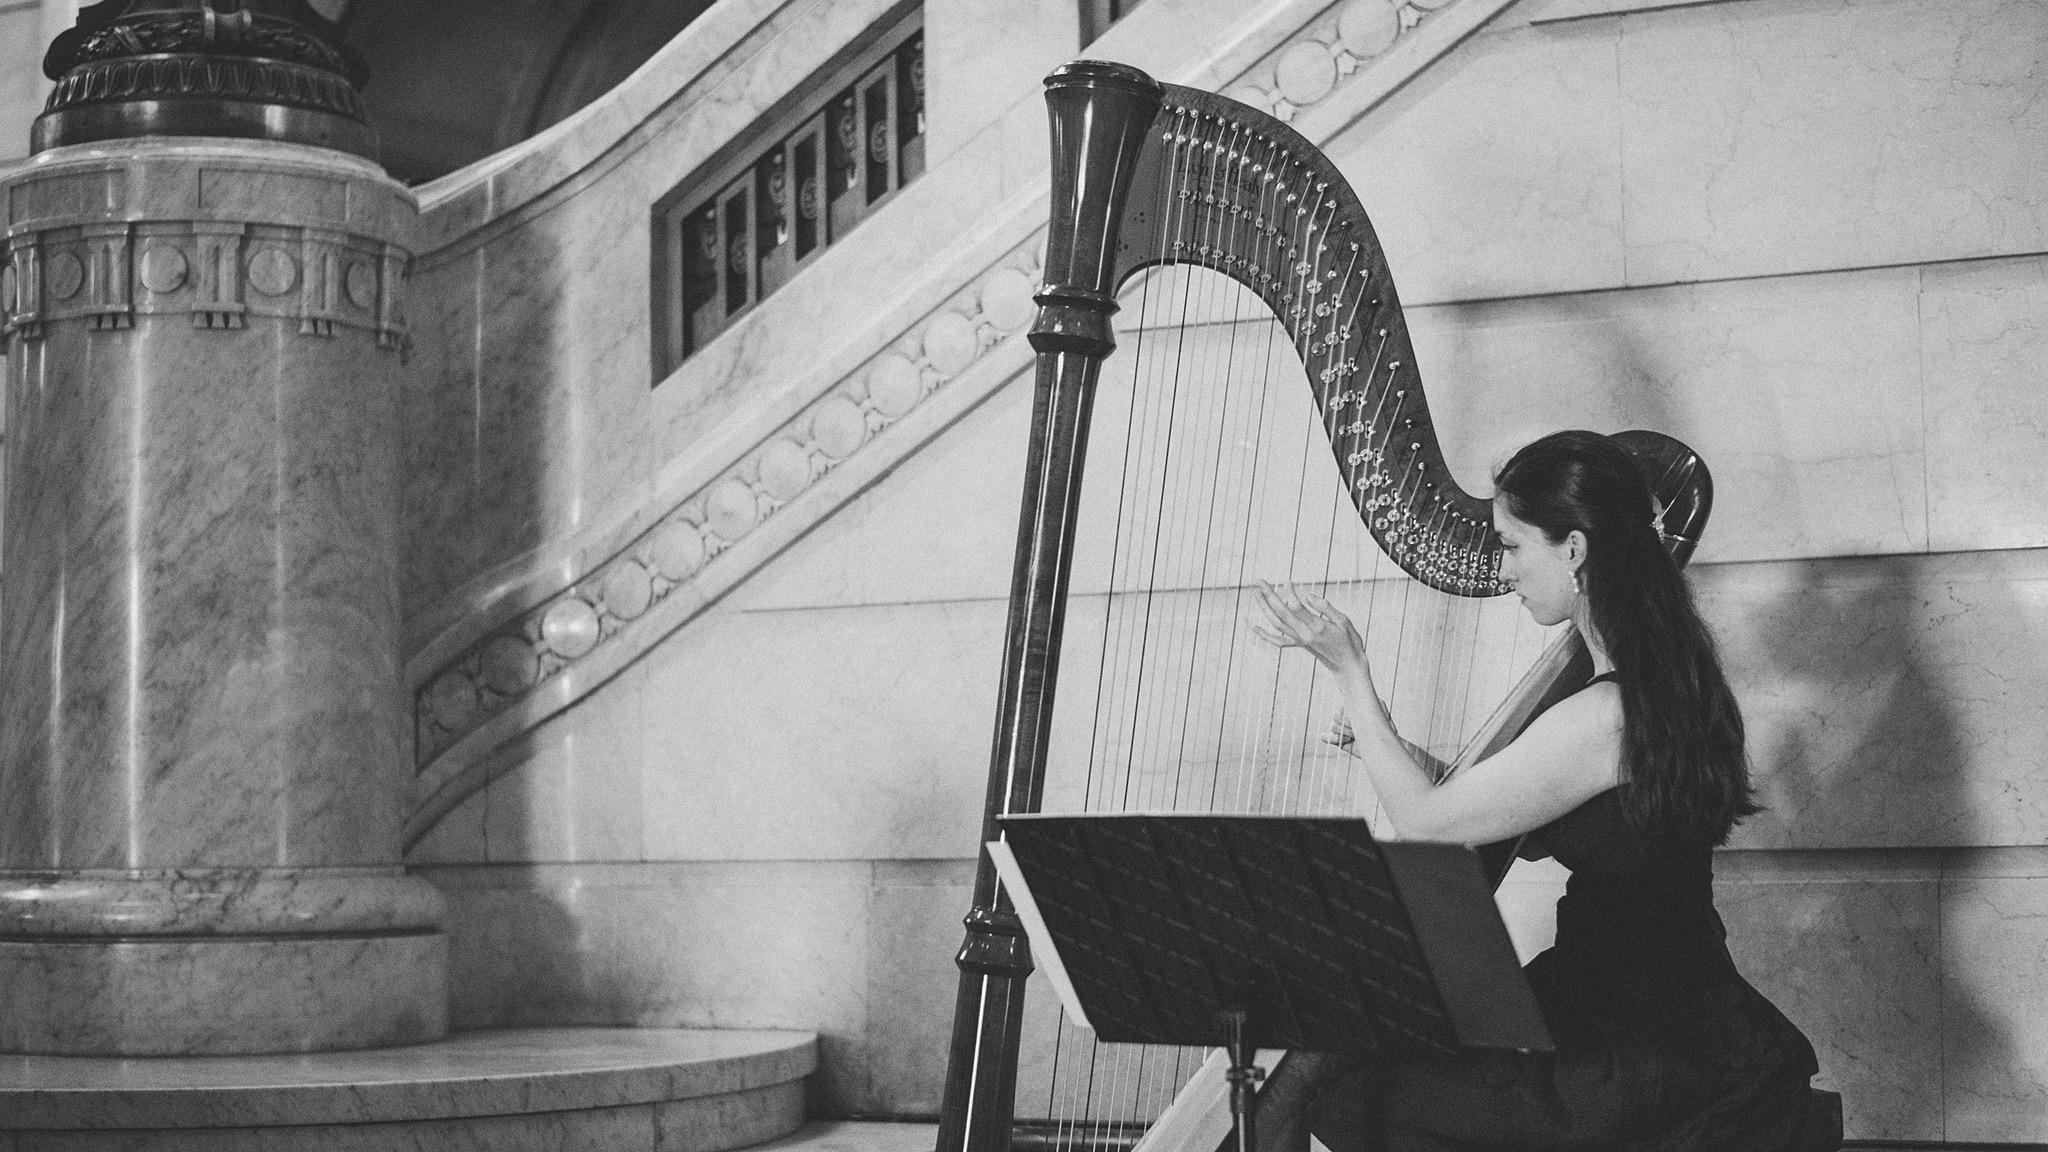 34-harp-wedding-musician.jpg